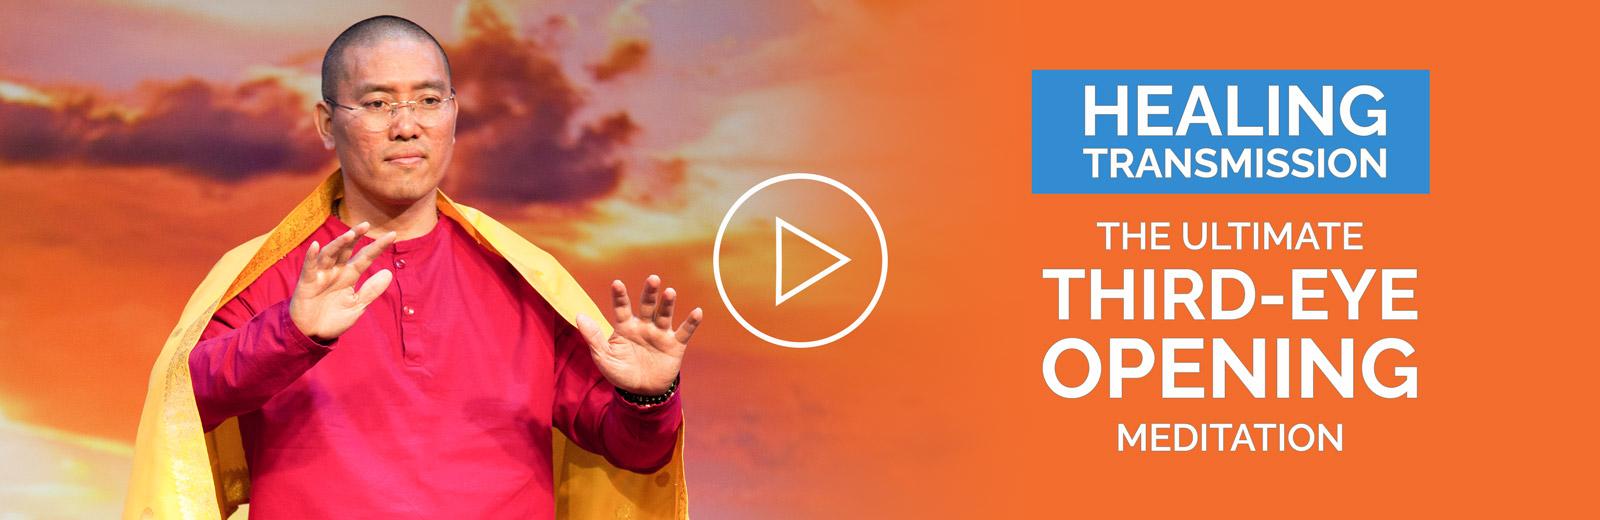 Video: Third Eye Opening Meditation